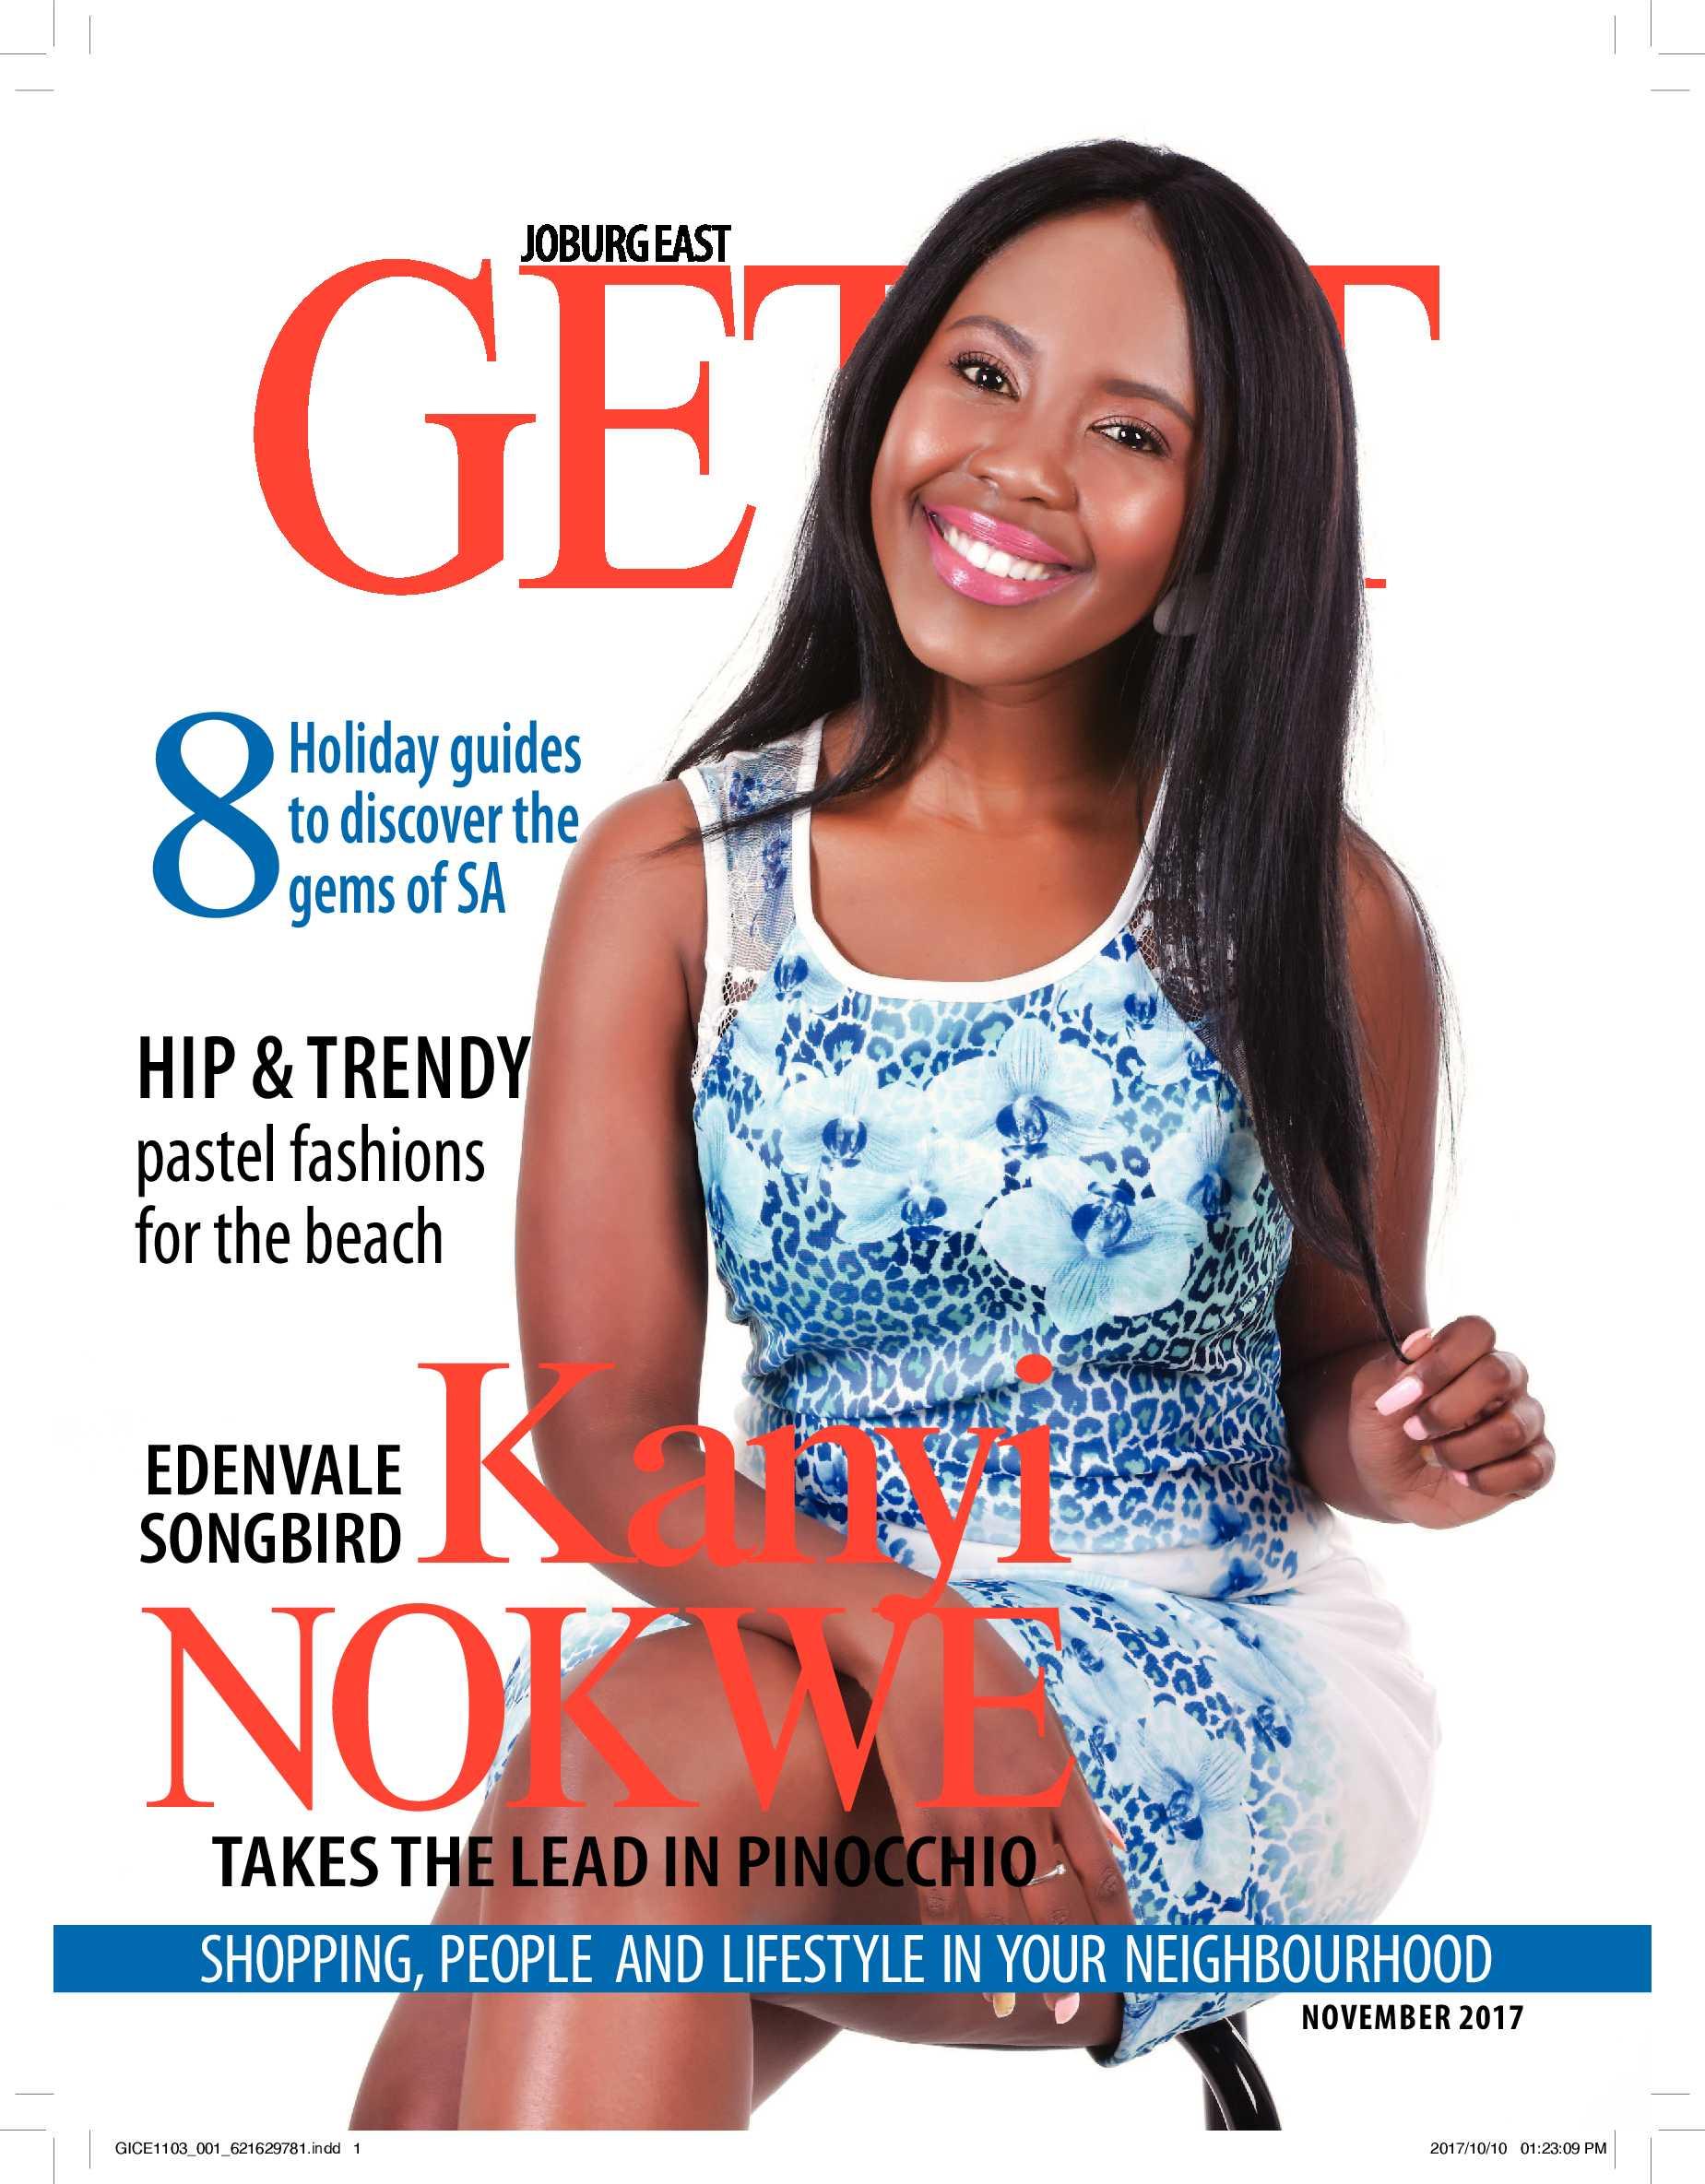 get-east-november-2017-epapers-page-1